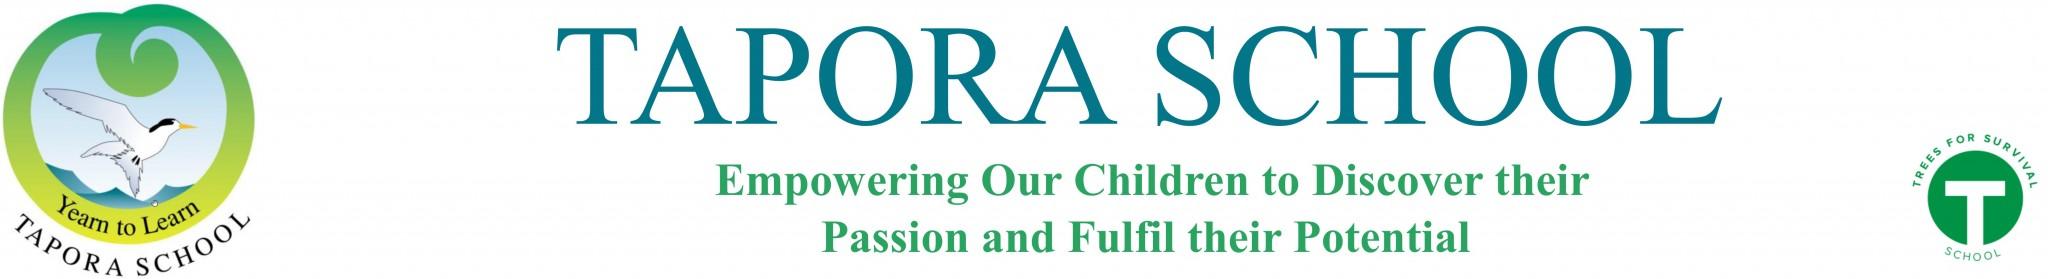 Tapora School Logo